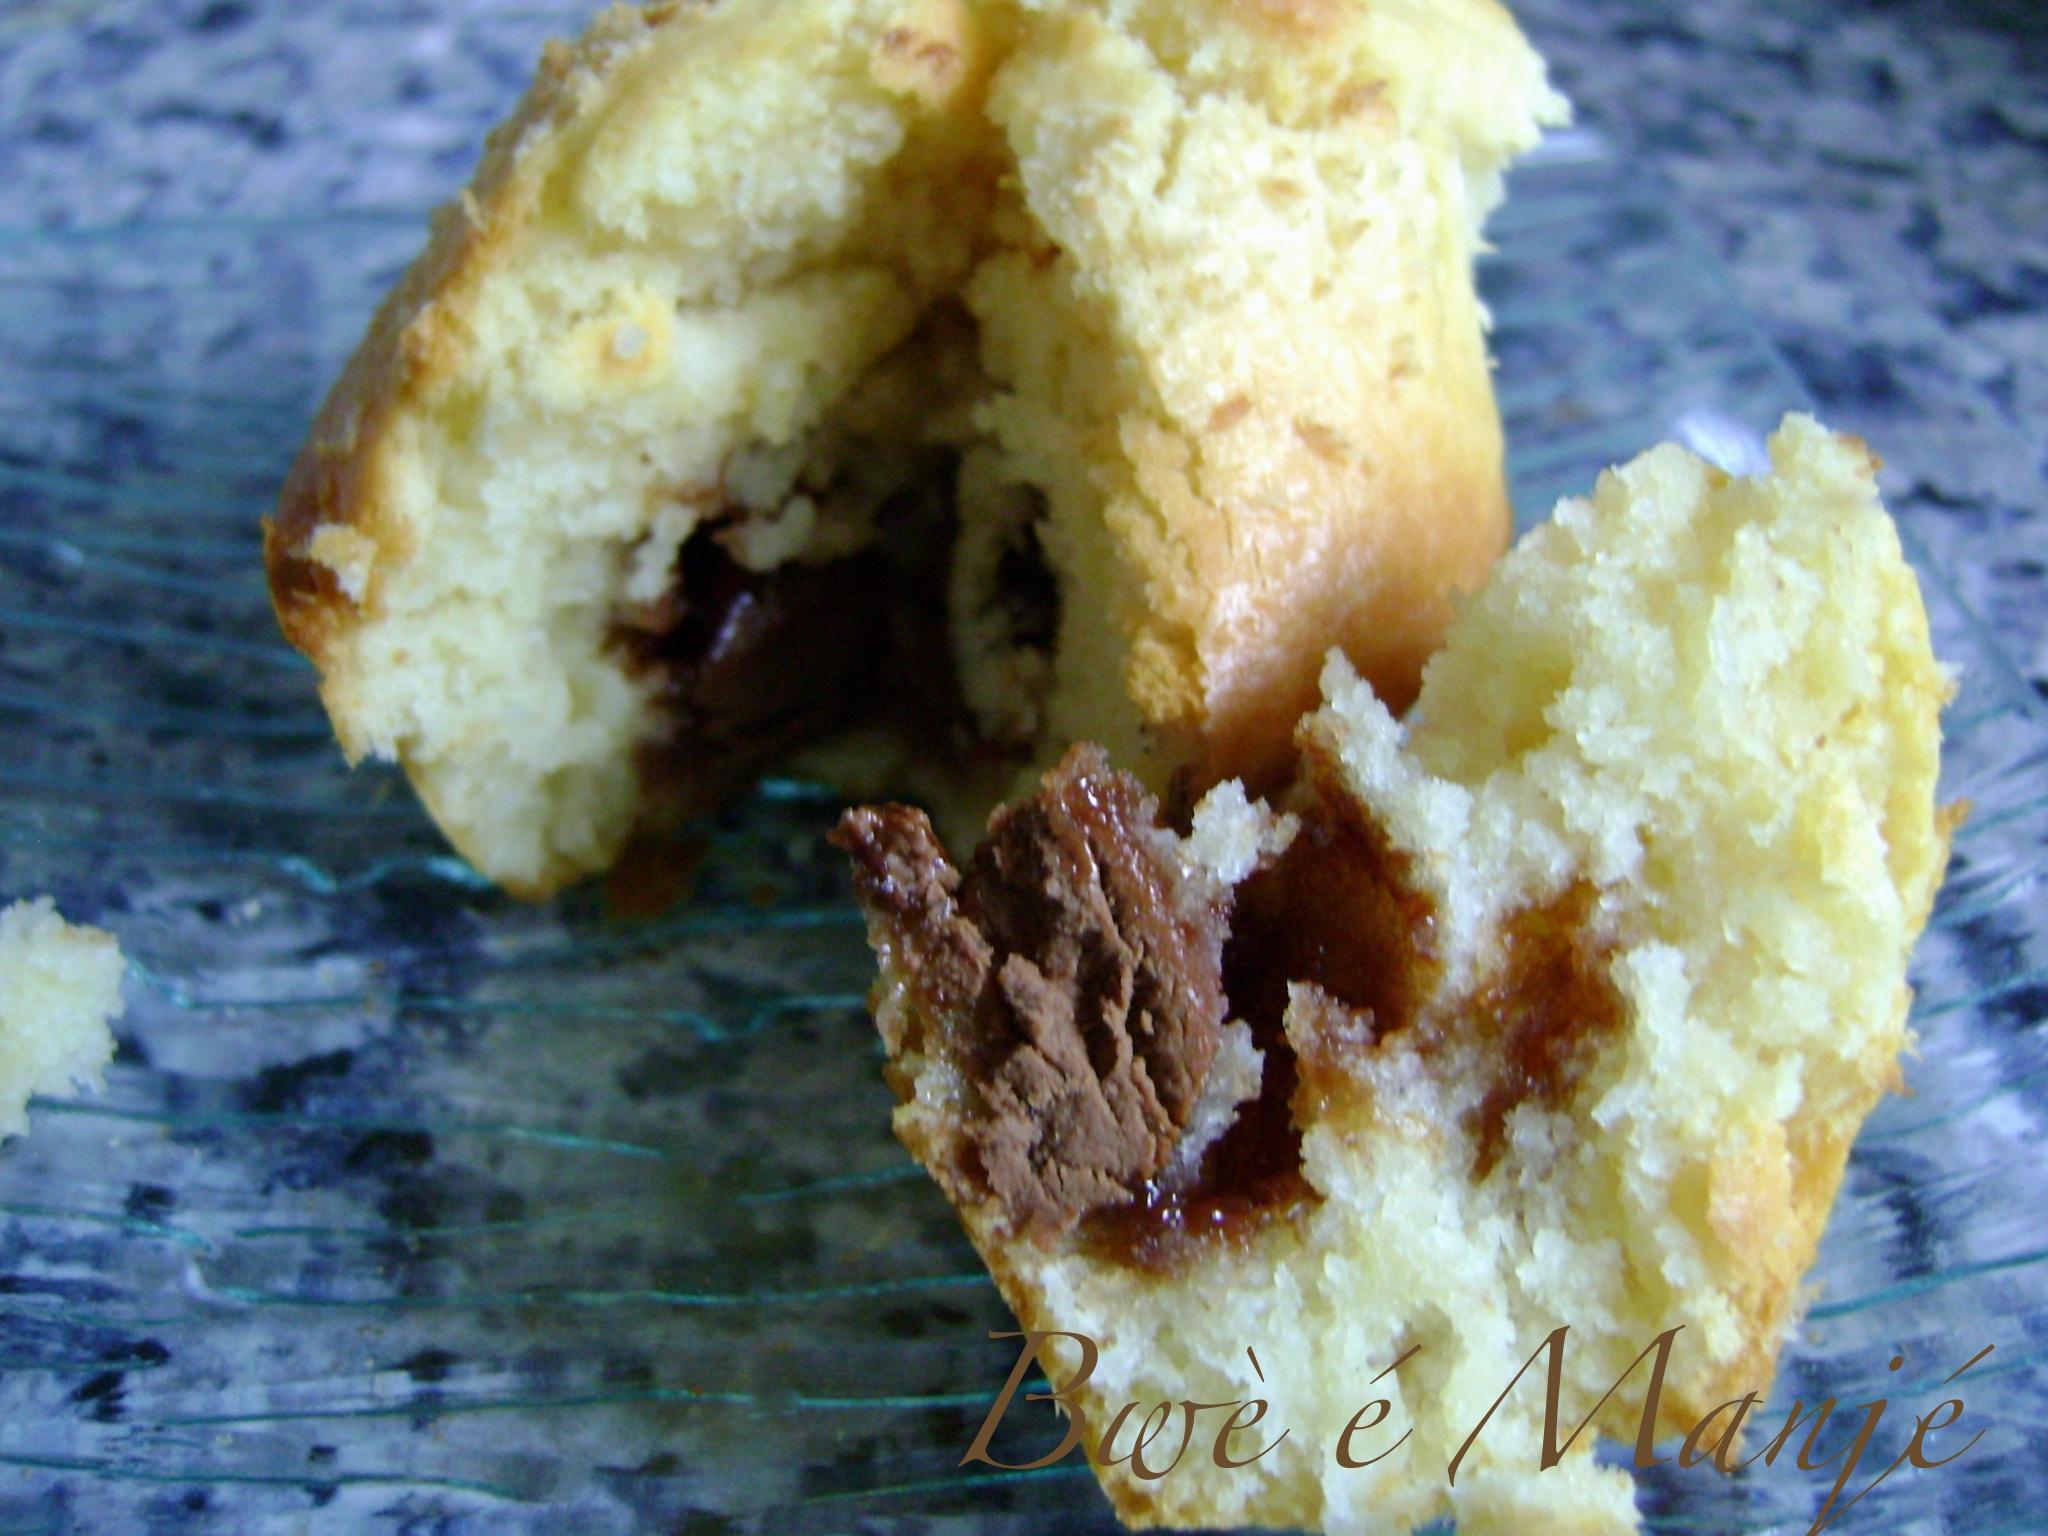 muffin coco coeur chocolat au lait